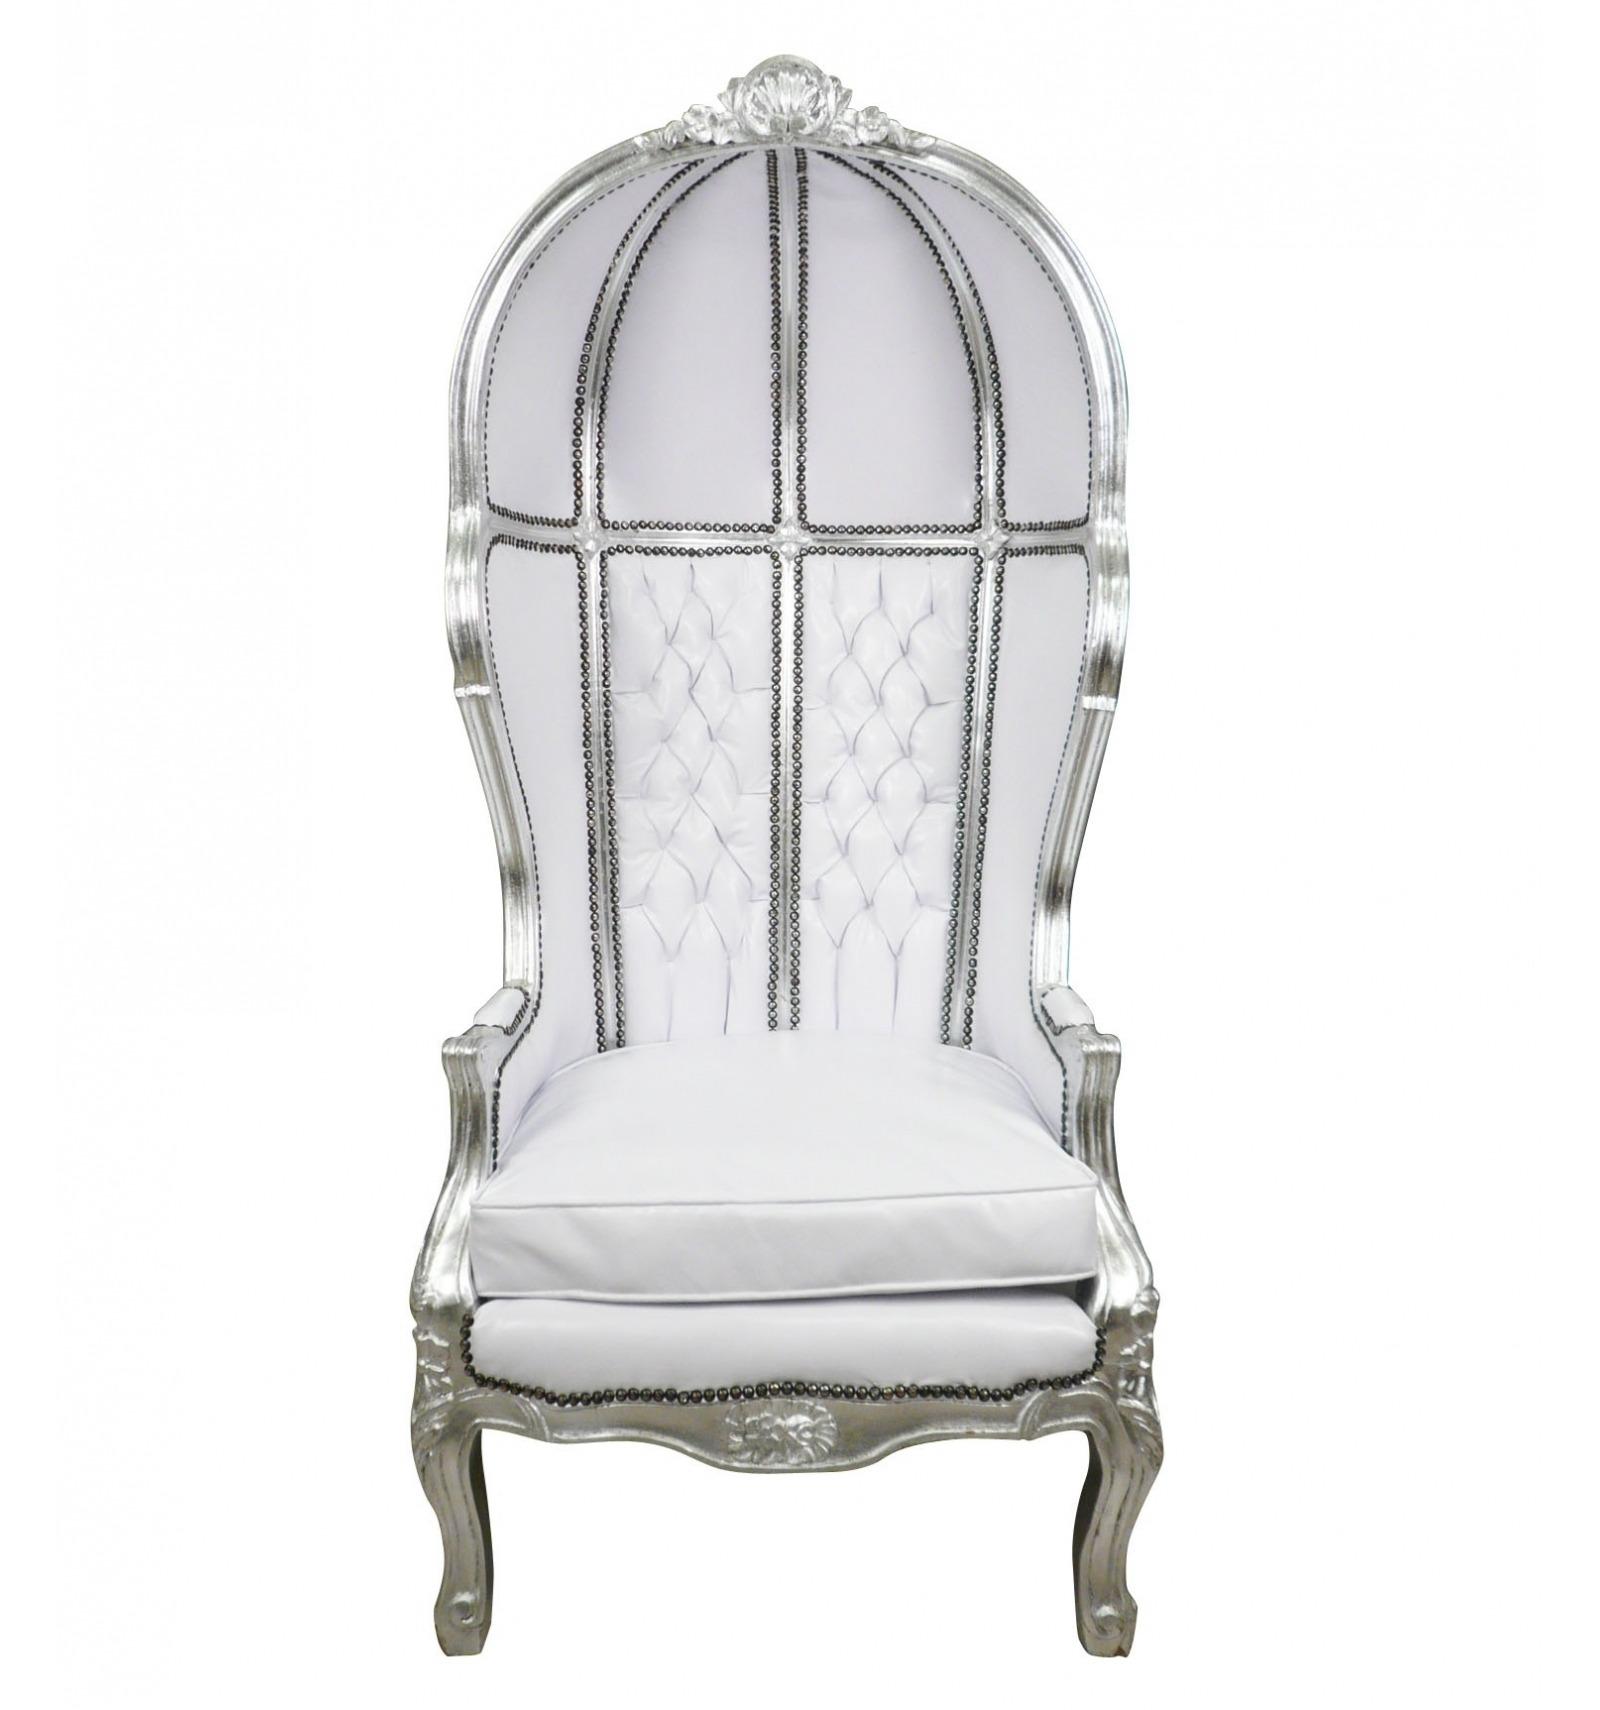 fauteuil baroque carrosse blanc ameublement baroque. Black Bedroom Furniture Sets. Home Design Ideas